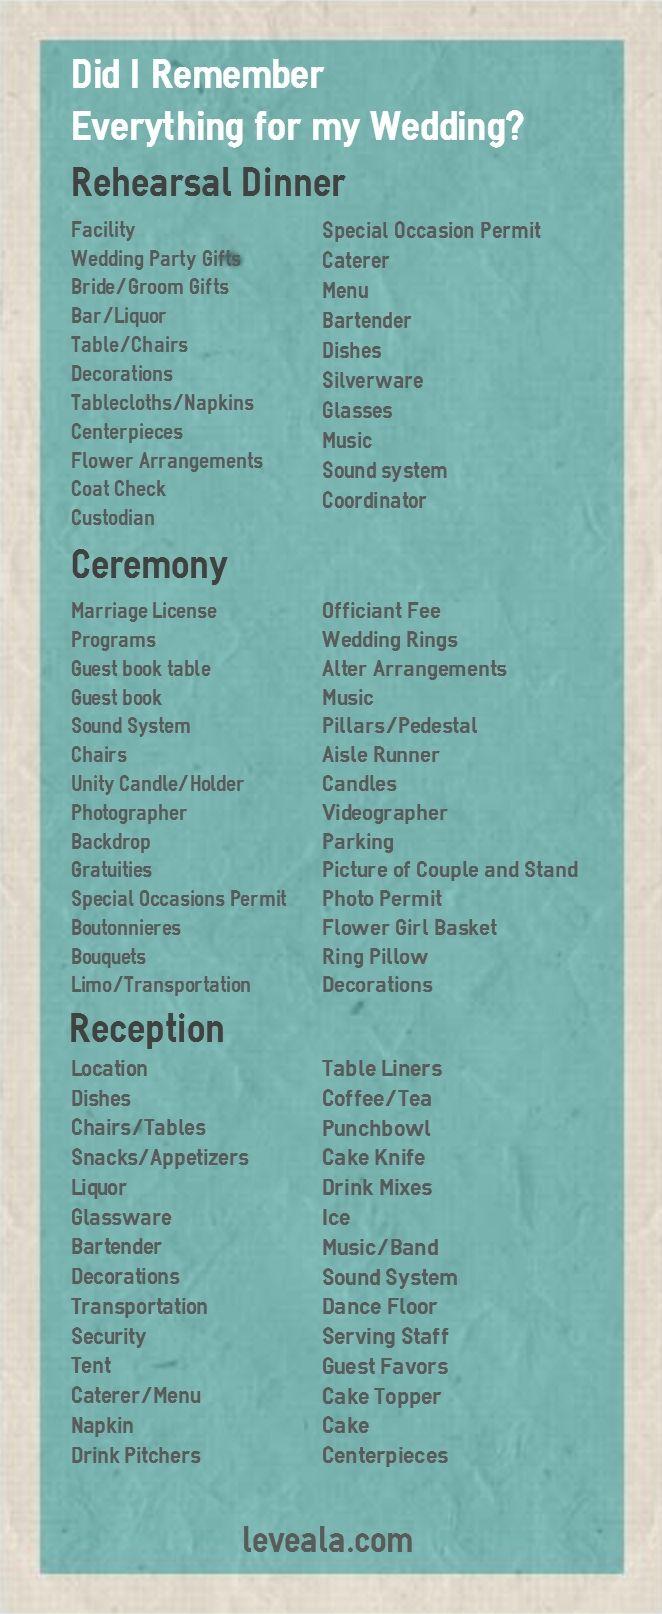 Wedding decorations list  Did I Remember Everything for My Wedding Wedding Checklist  The